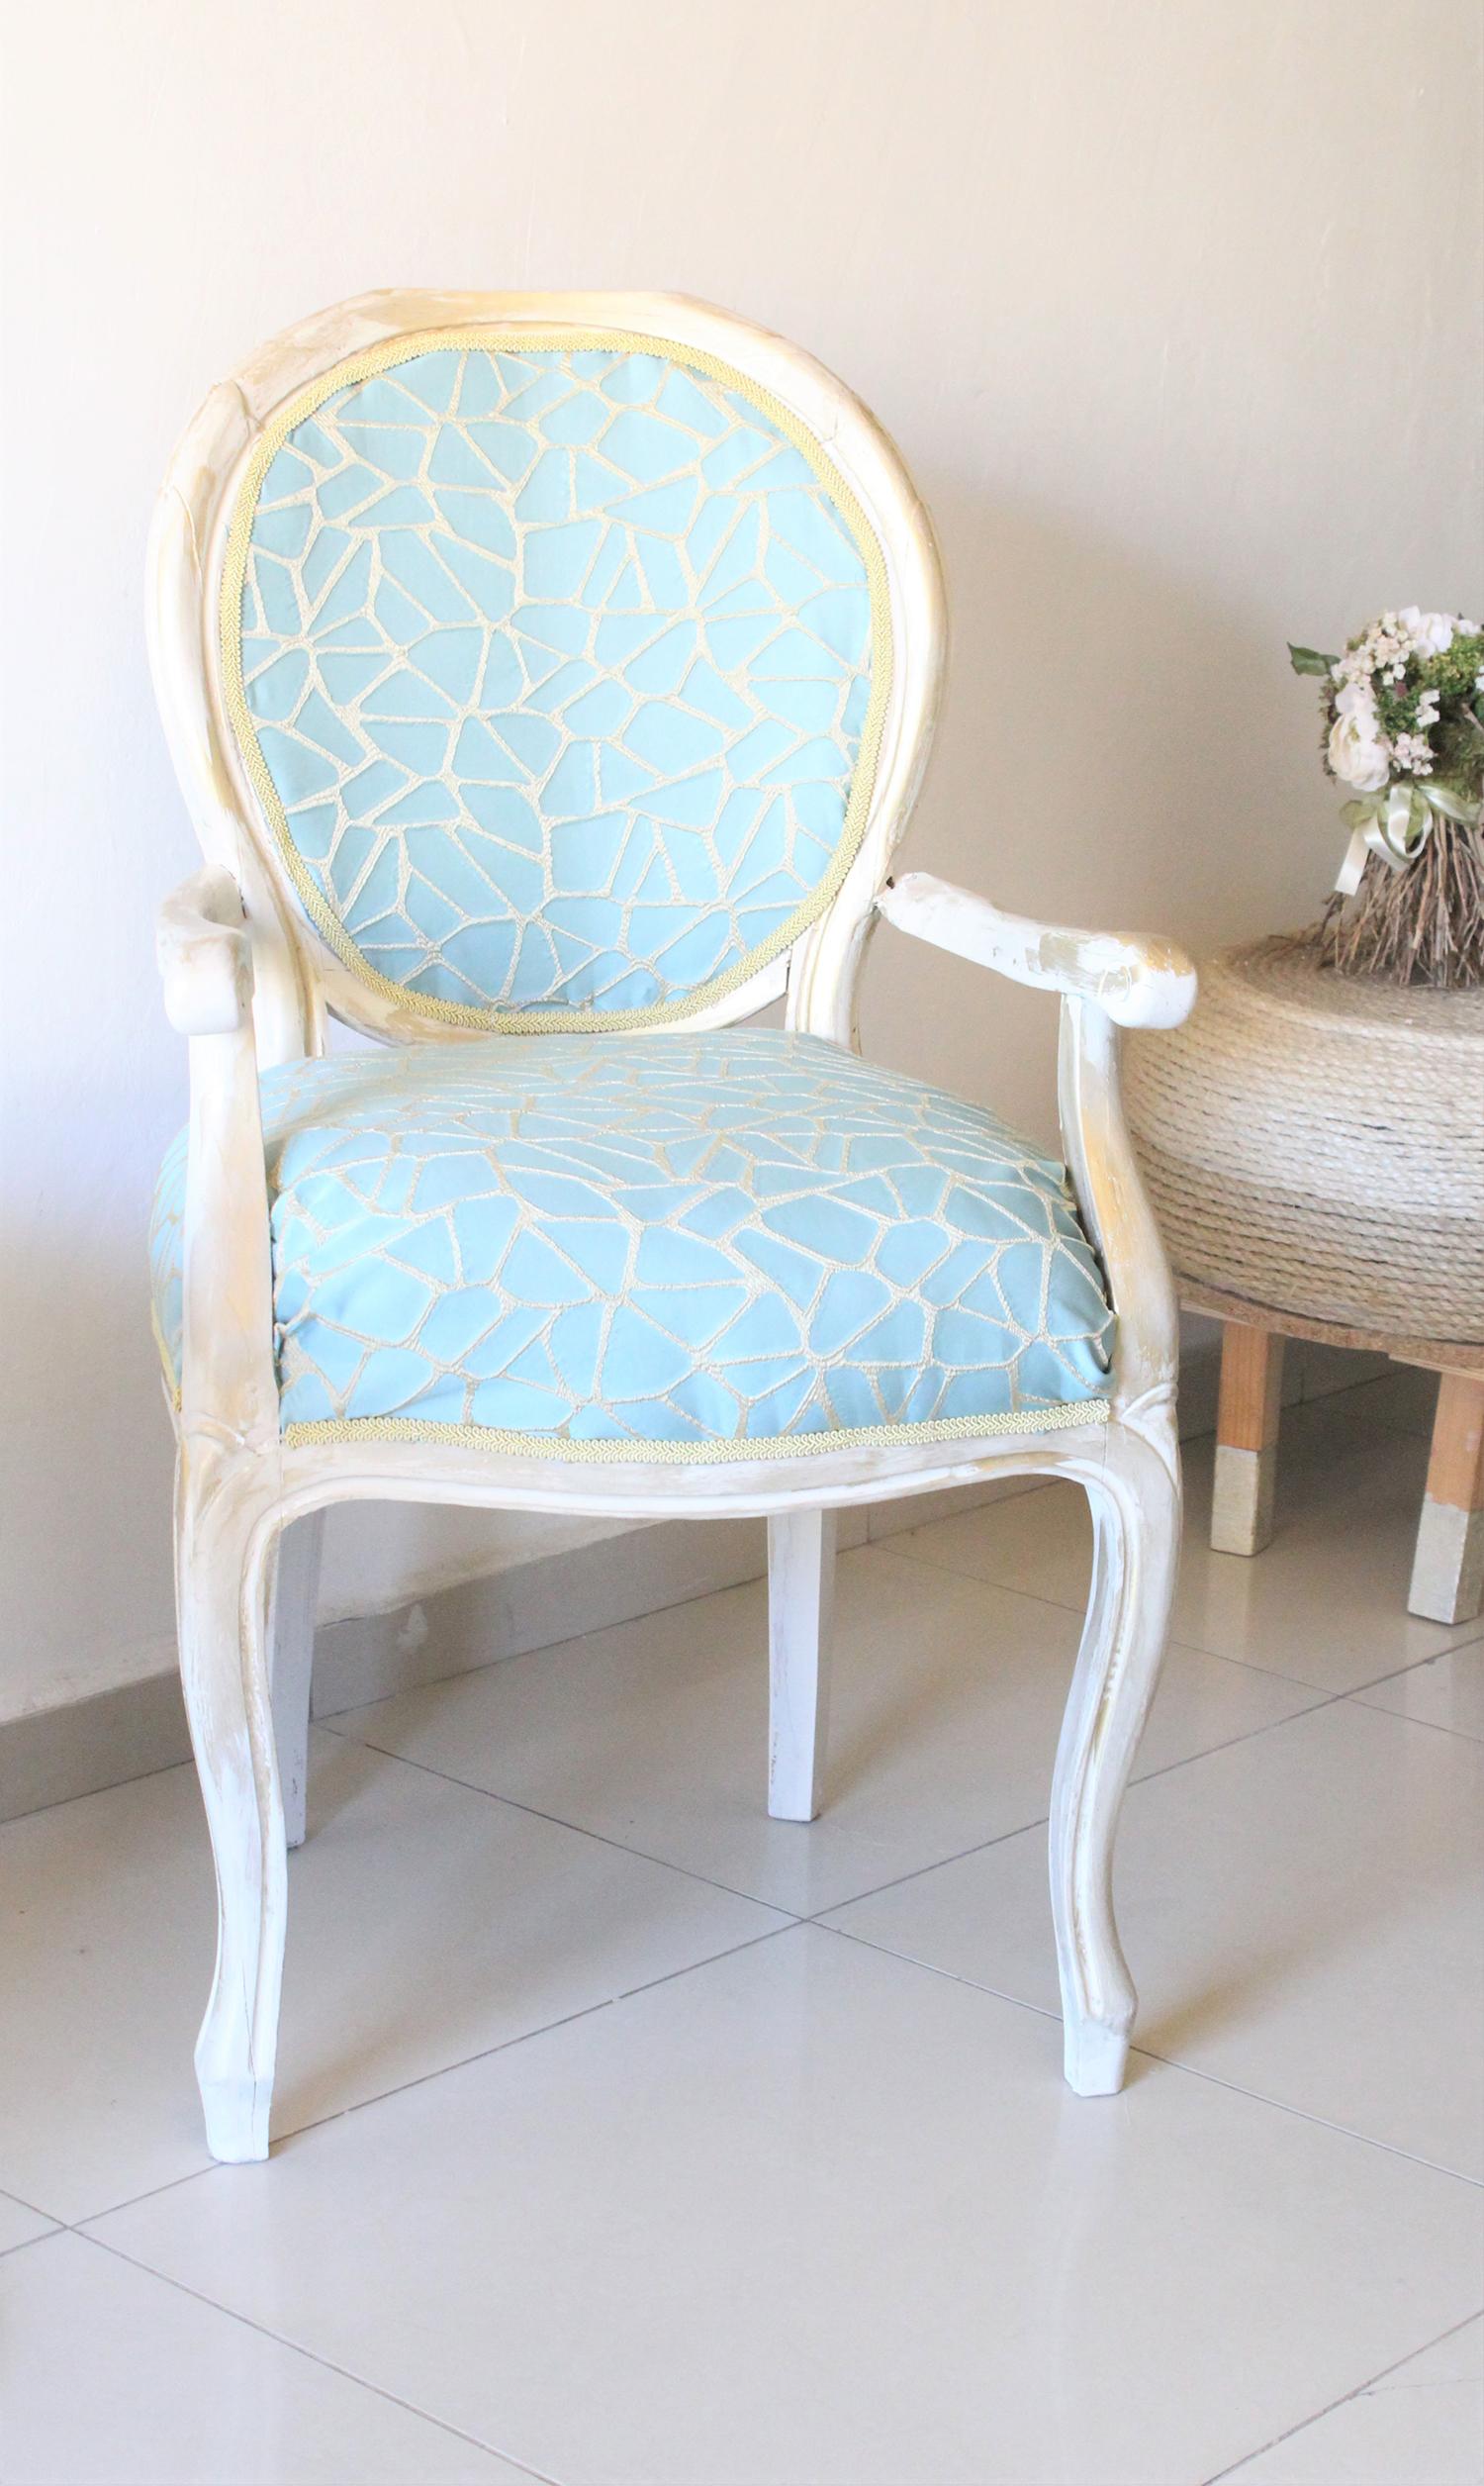 IMG 7419 - חידוש מחודש של שני כסאות